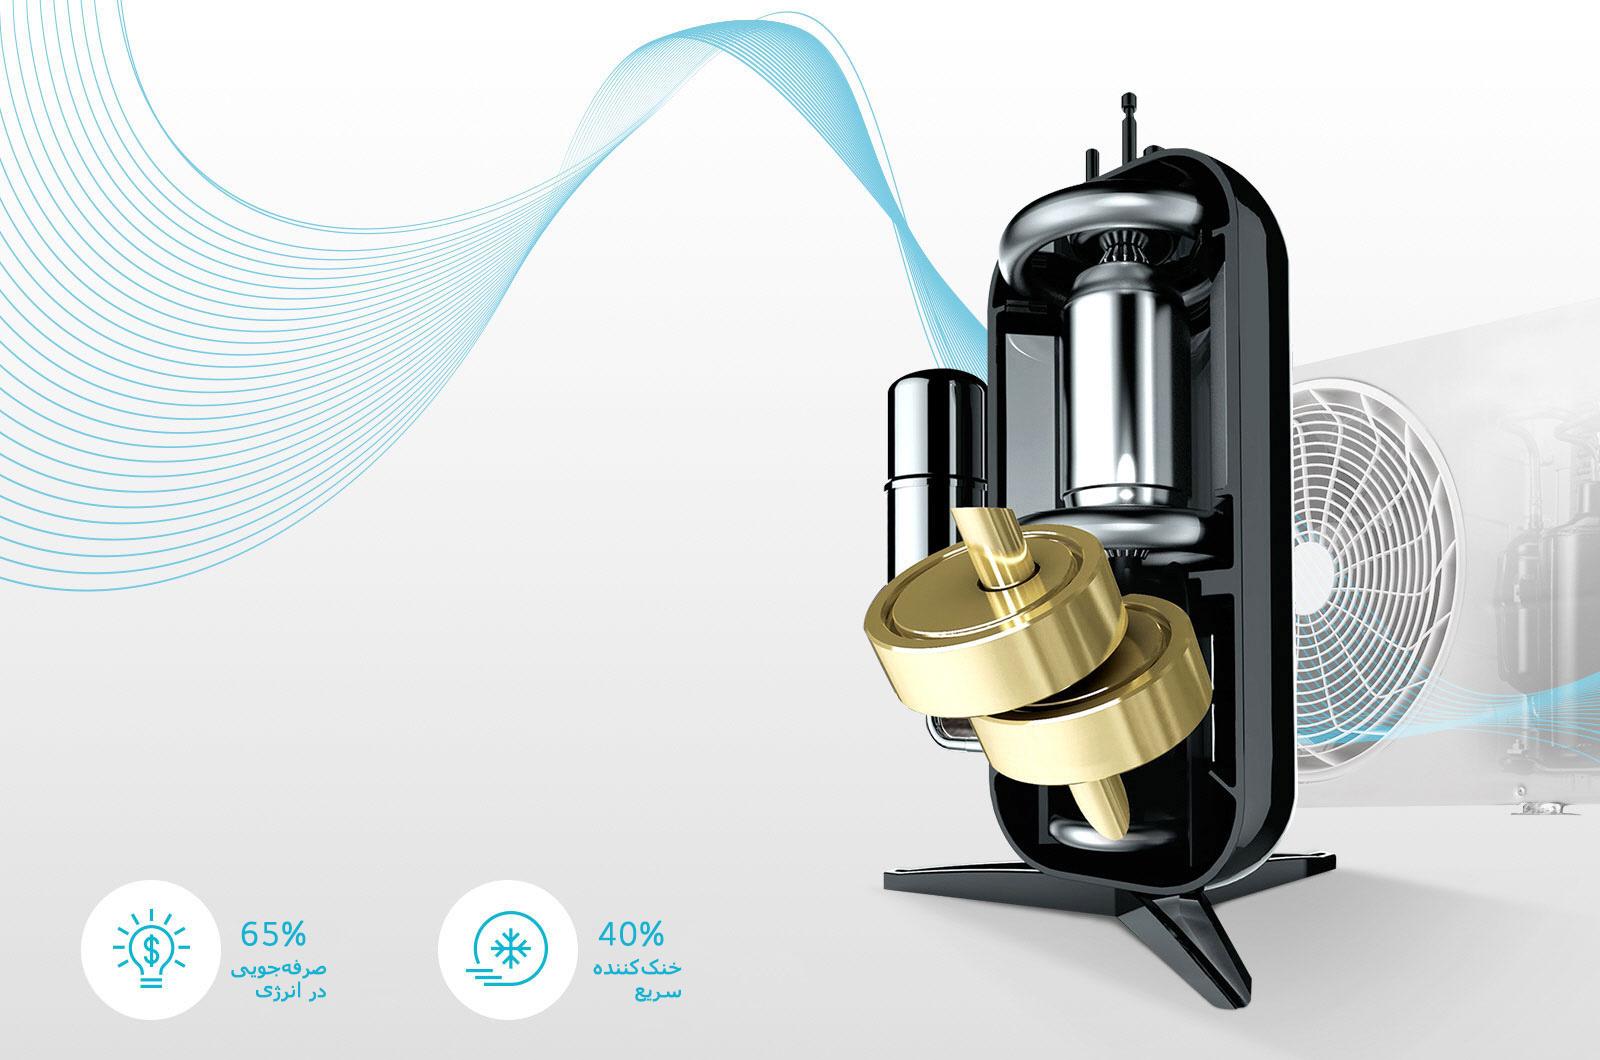 01_Dual_Inverter_Compressor_D-V001